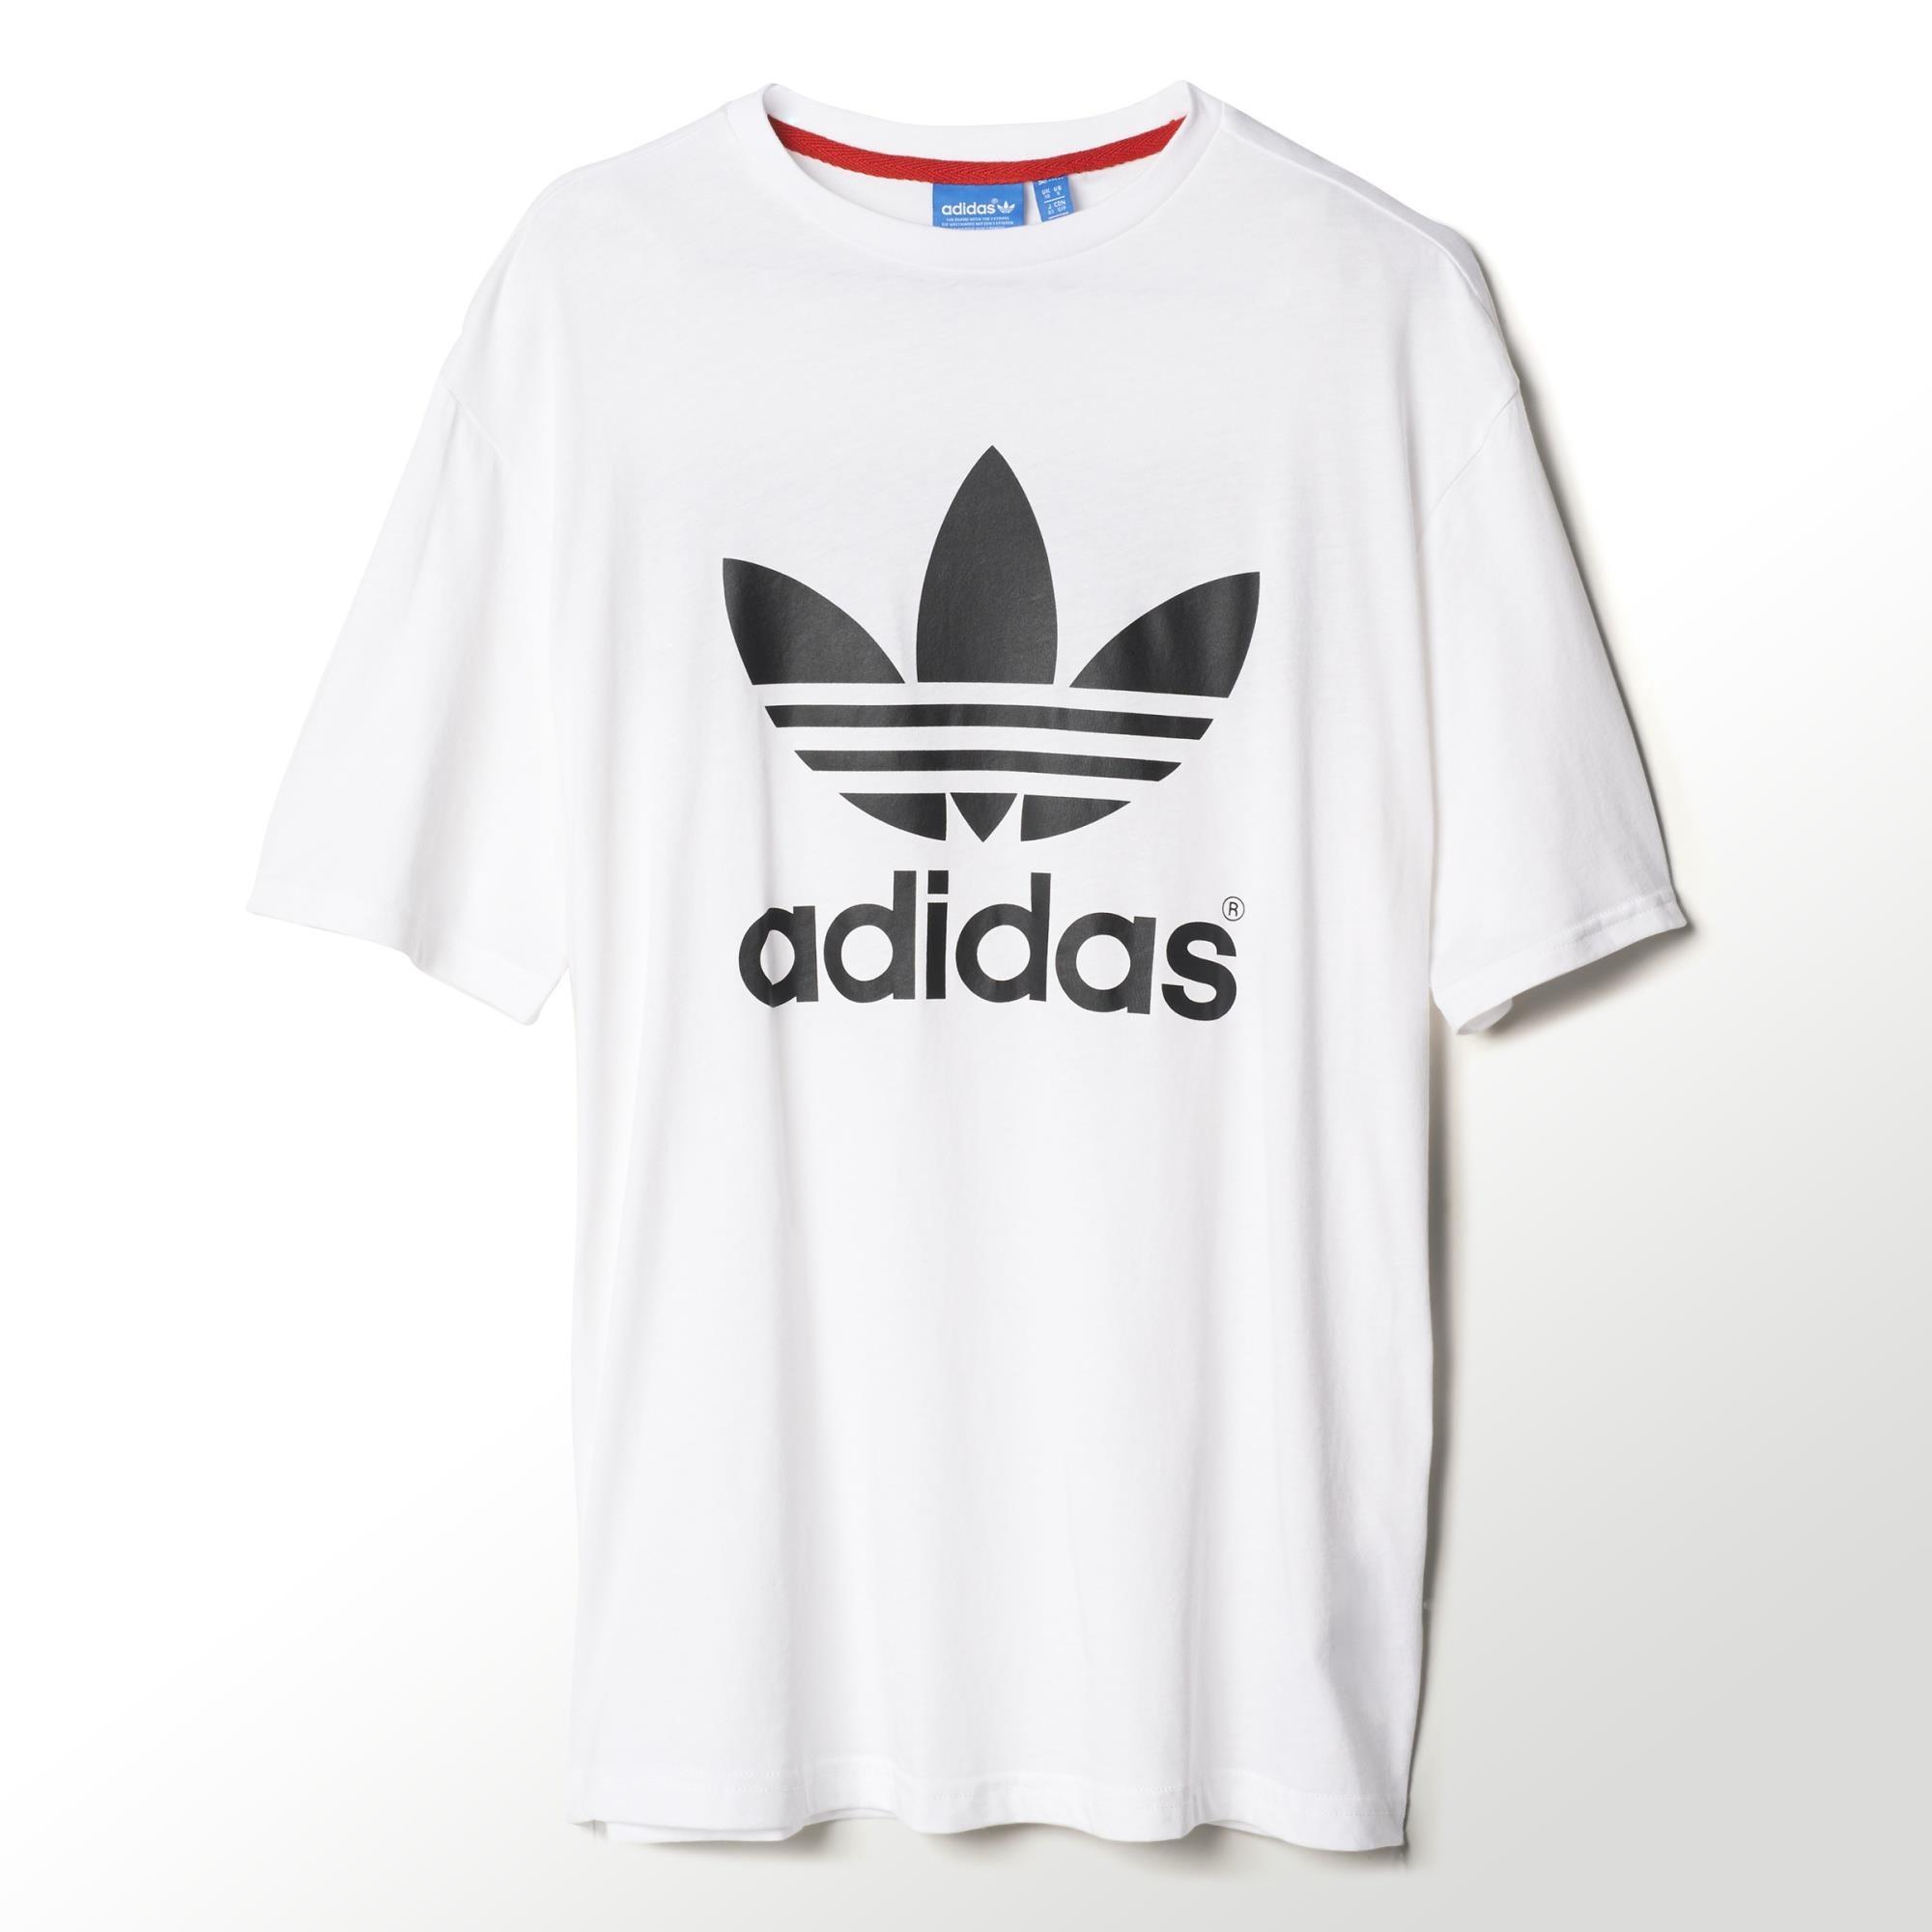 T shirt adidasadidas bianco Superstar Topshop Italia lJ1KTFc